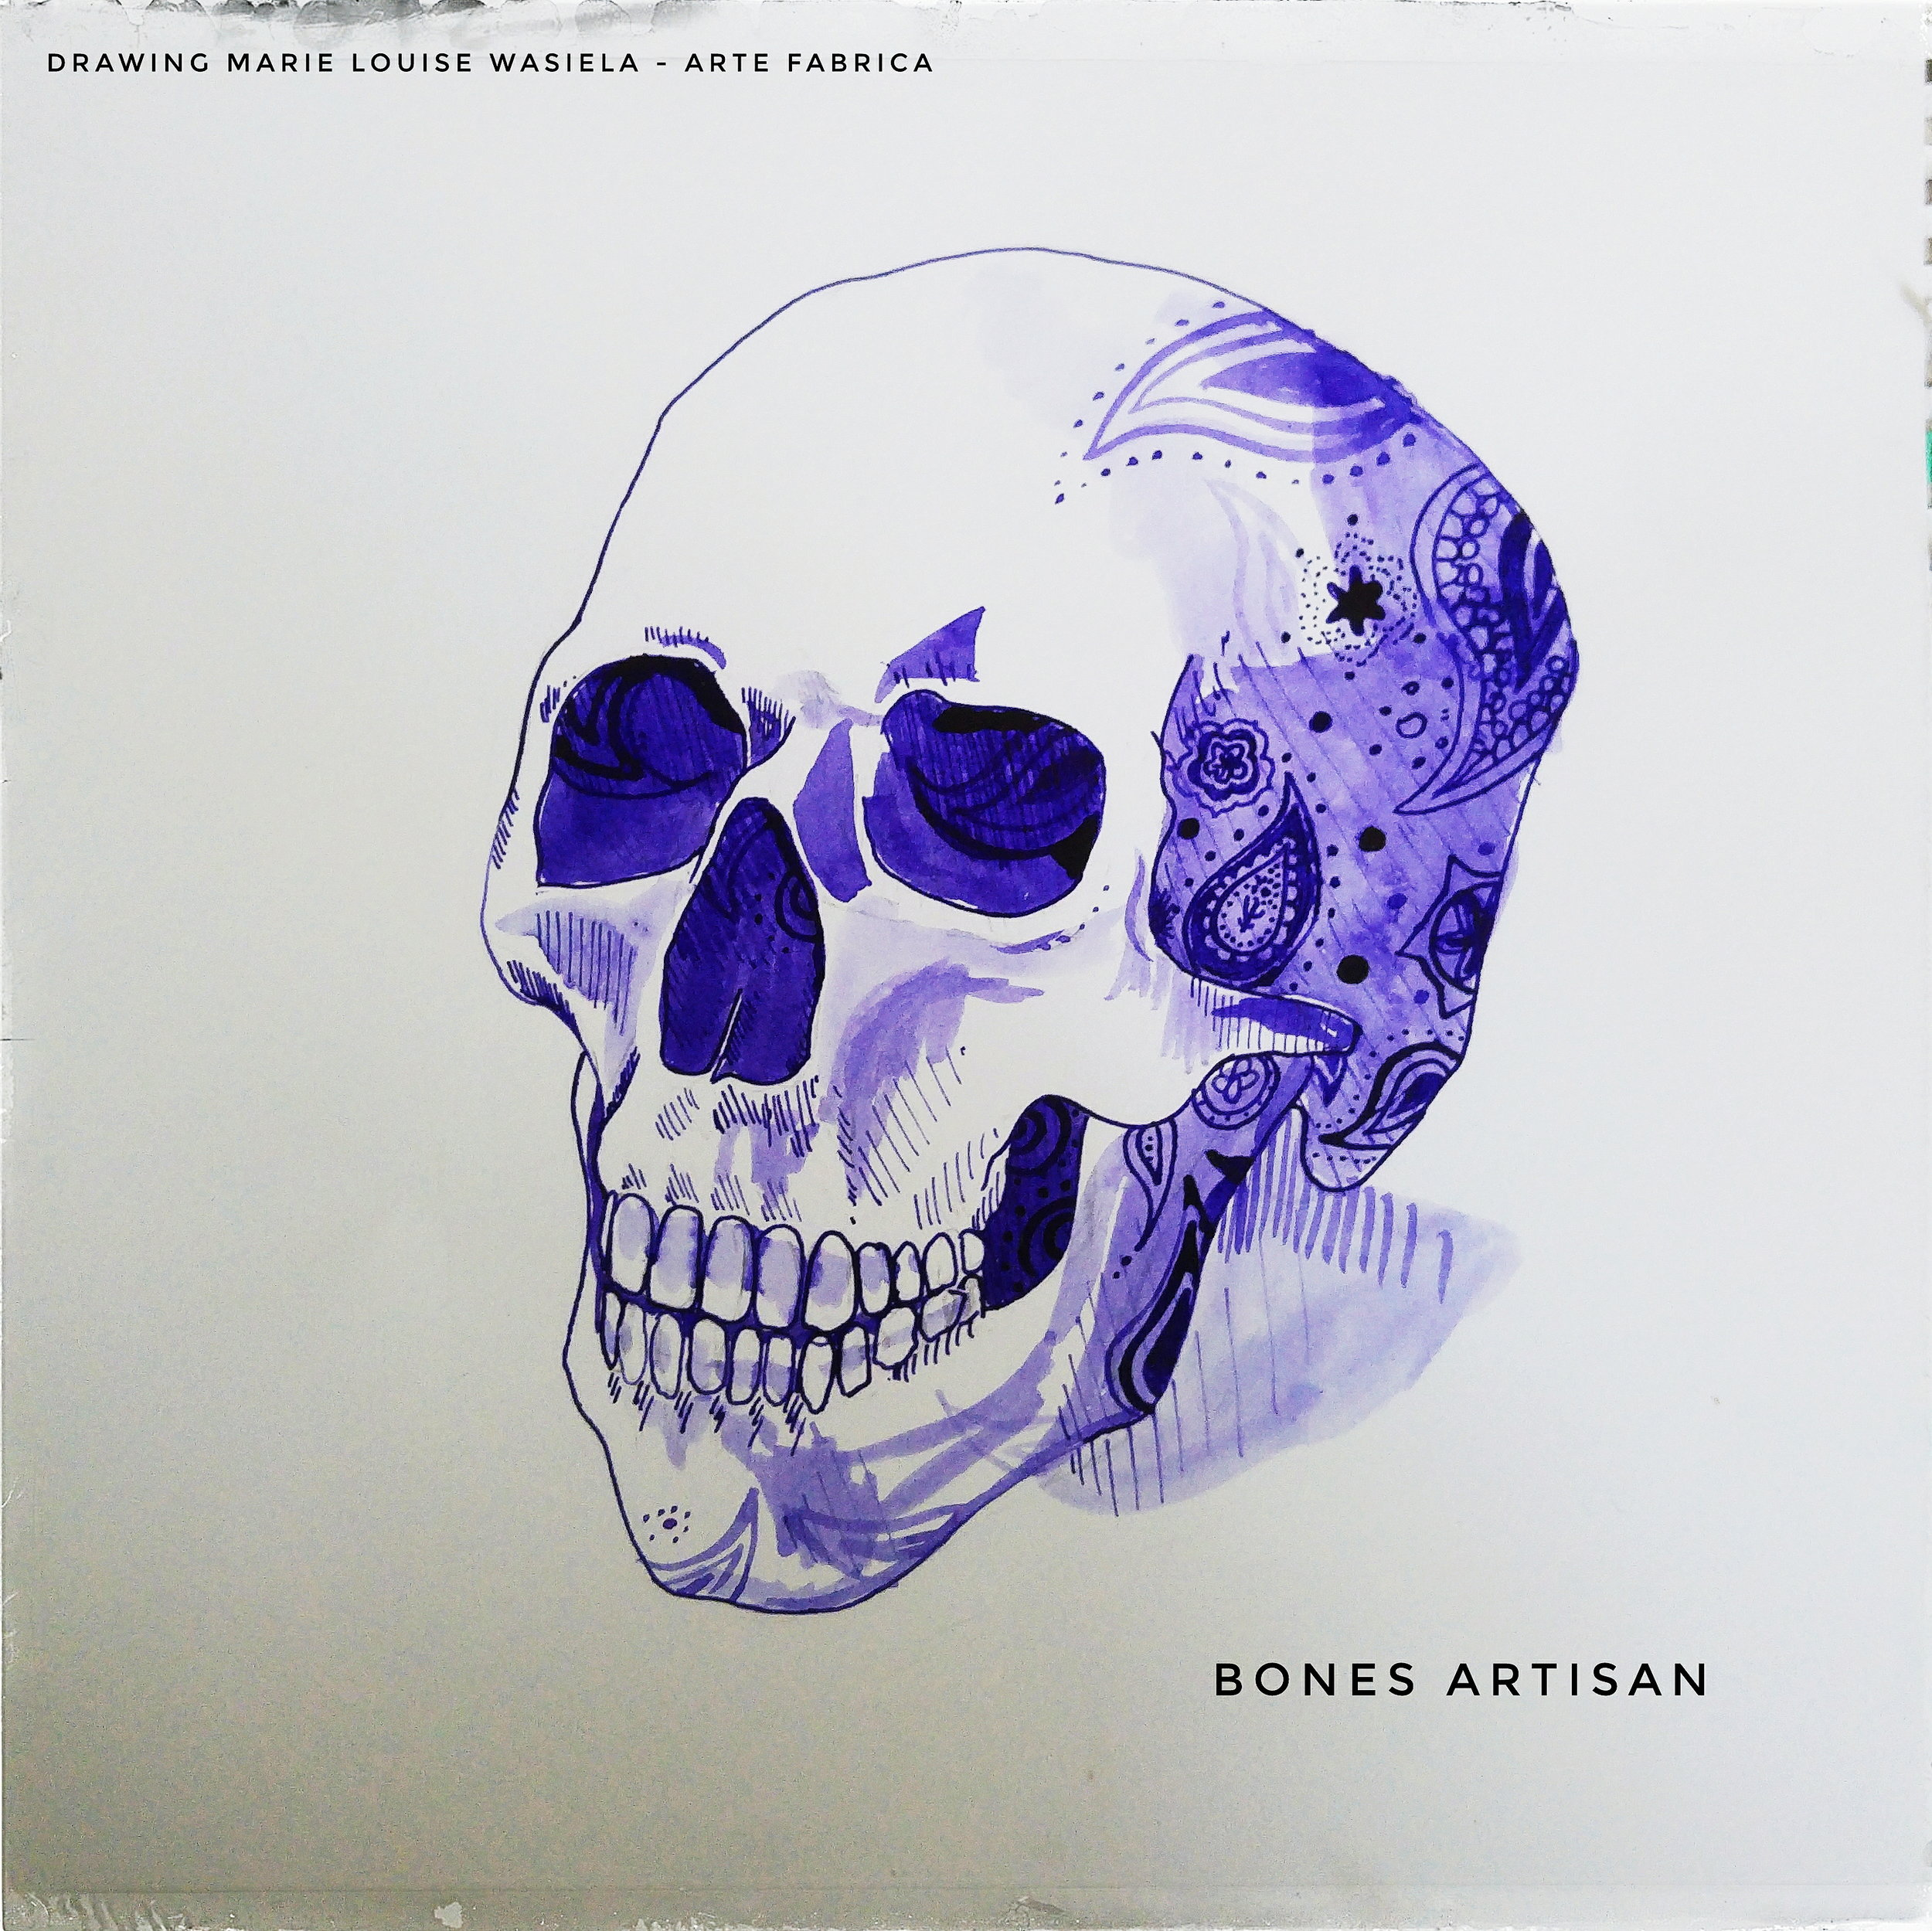 BONES Artisan logo rendition by Marie Louise Wasiela